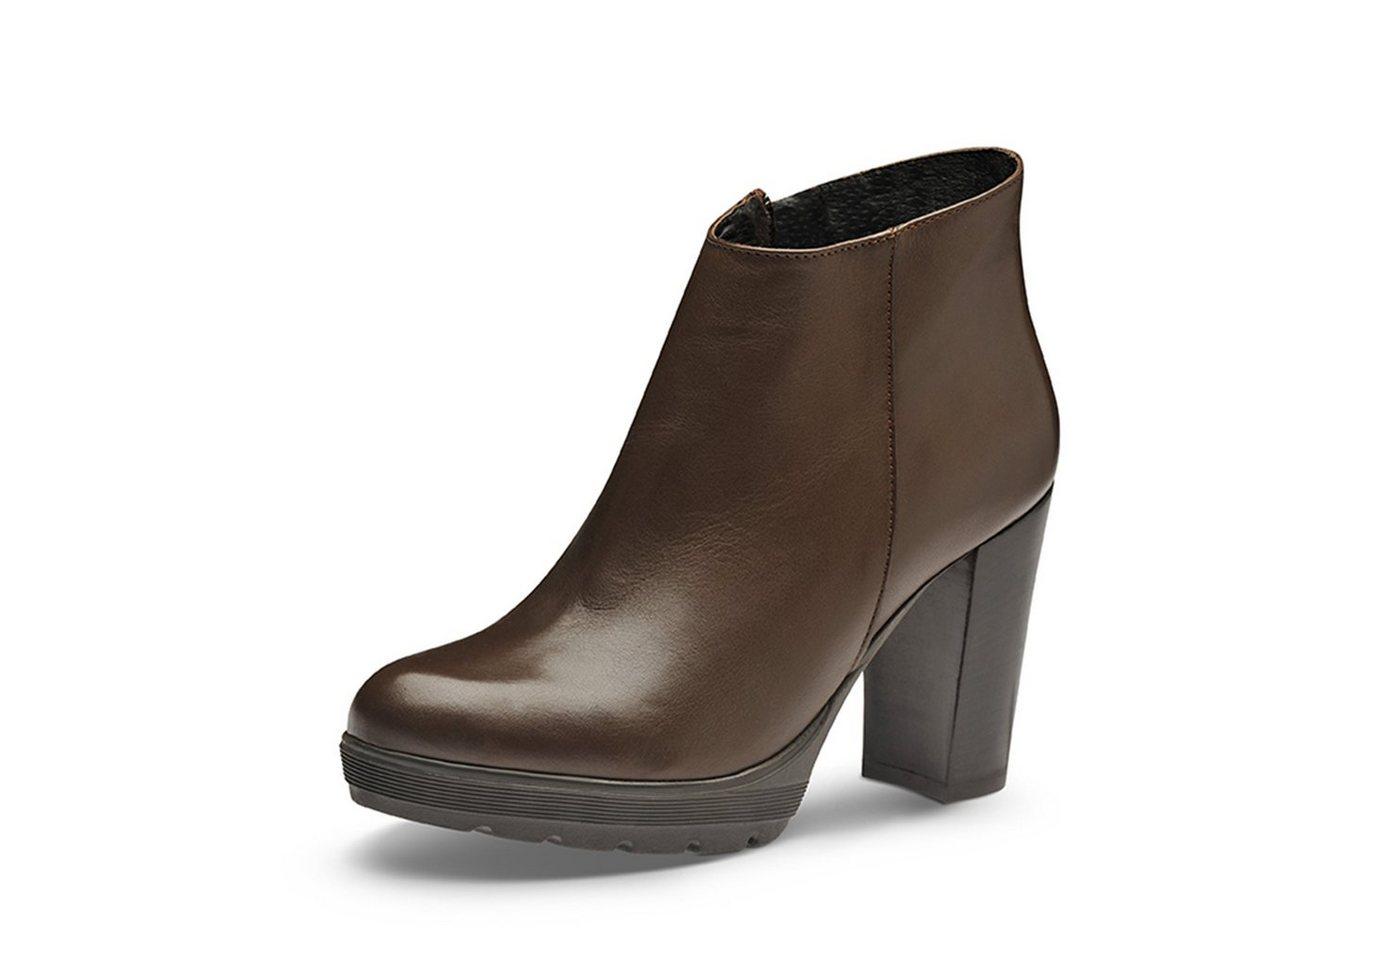 Evita »UBALDA« Plateaustiefelette   Schuhe > Stiefeletten > Plateaustiefeletten   Braun   Leder   Evita